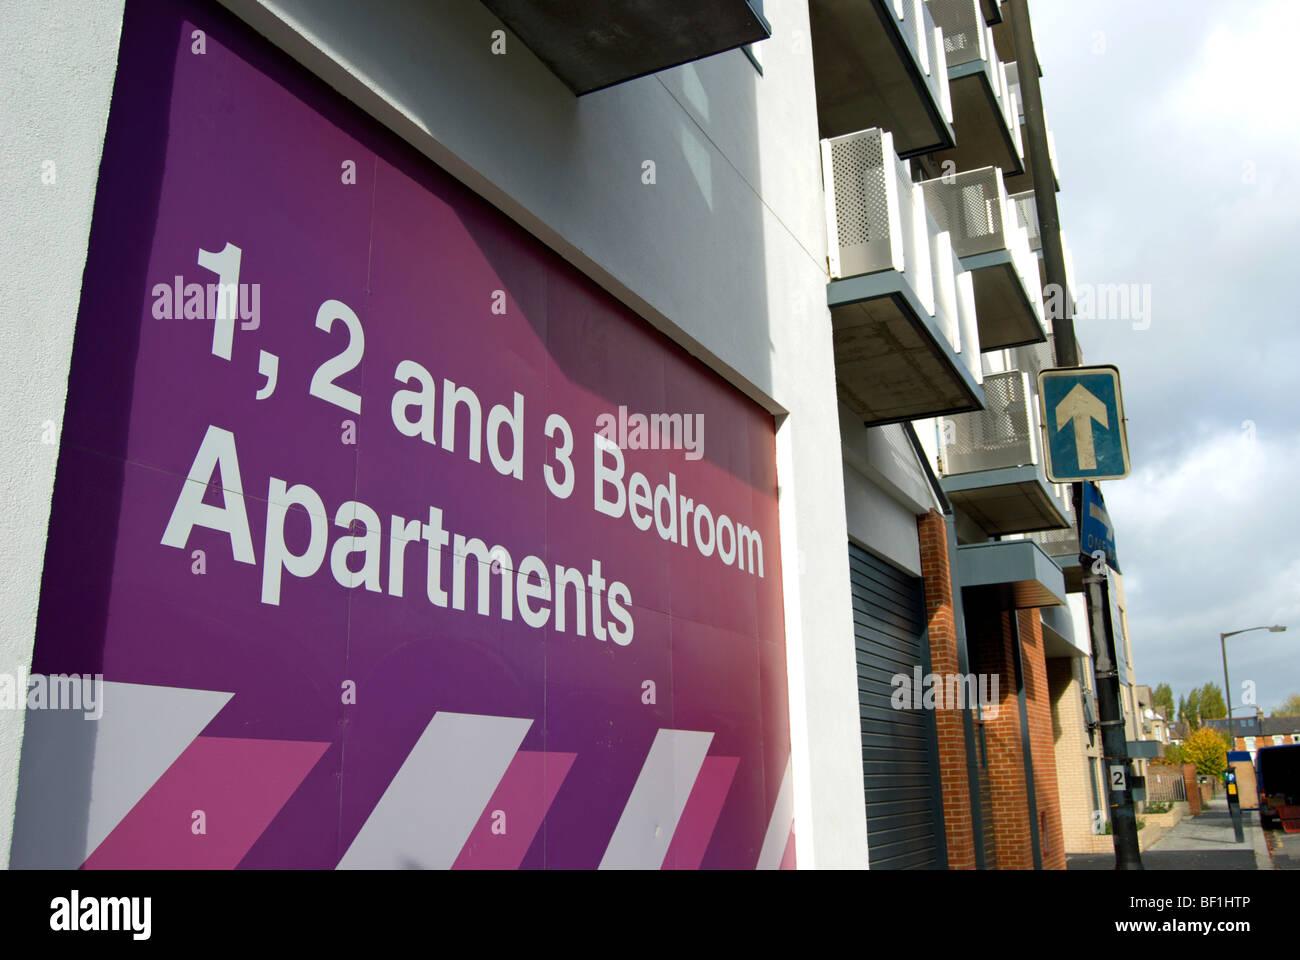 3 Bedroom Apartments In London England Excellent 3 bedroom London